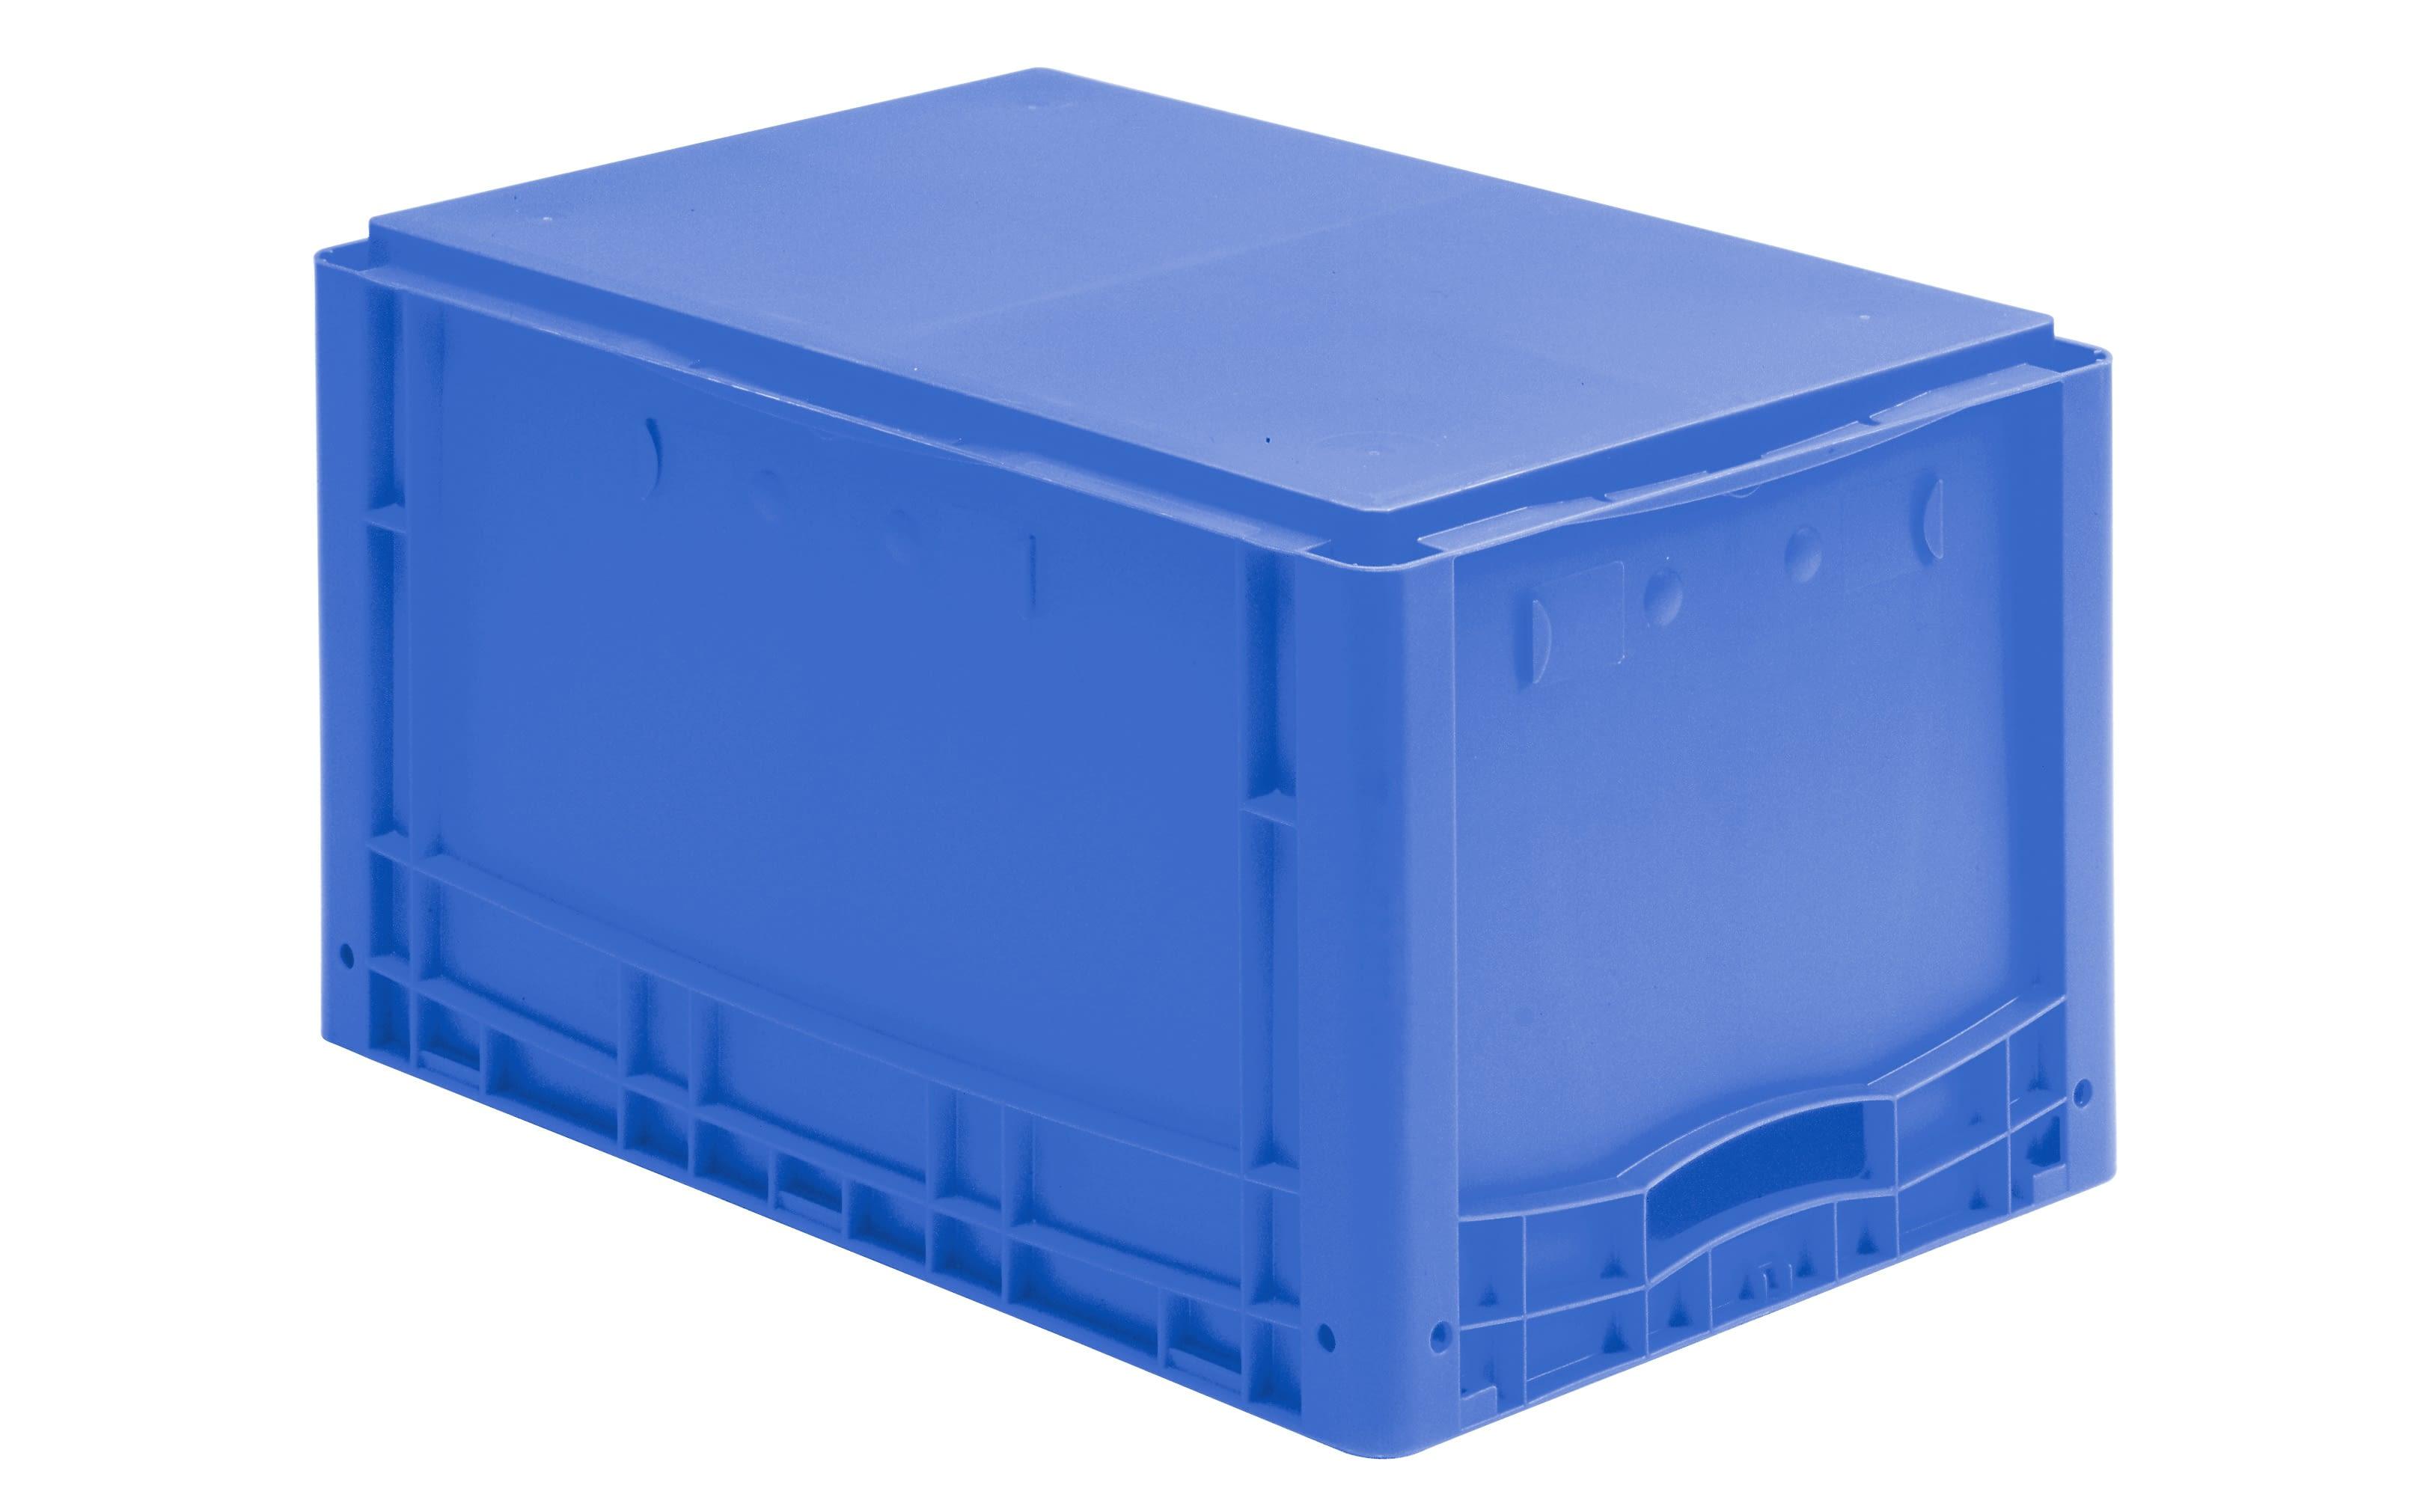 Eurostapelbehälter XL, Wände geschlossen, blau, IMG_18554